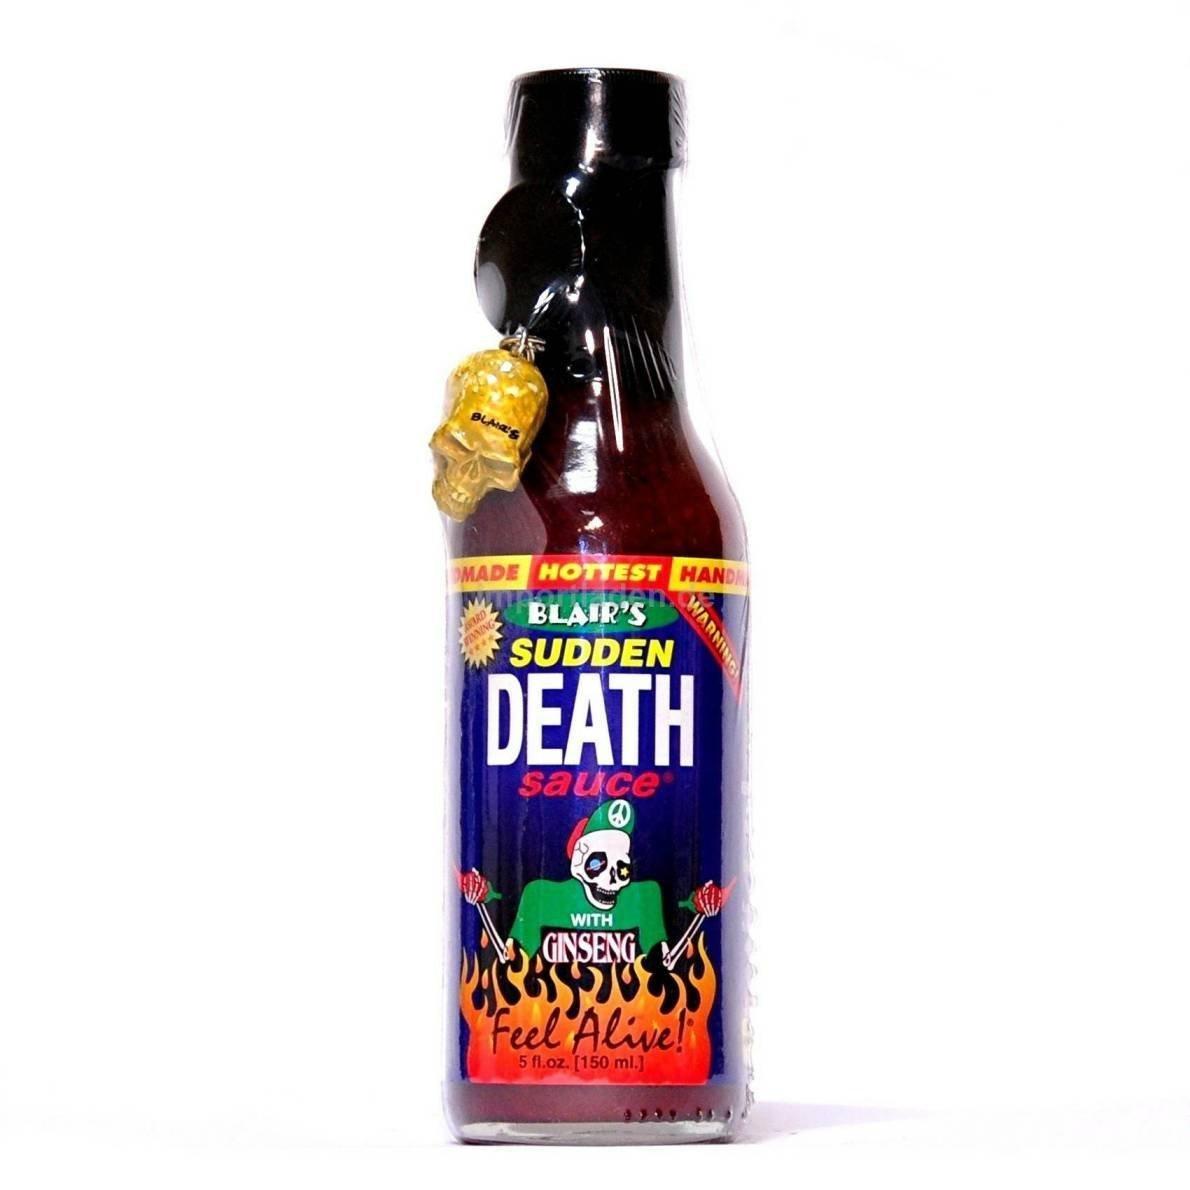 Blair S Sudden Death Sauce Xx Hot Schärfe 9 Buy Online In United Arab Emirates At Desertcart Ae Productid 56041696